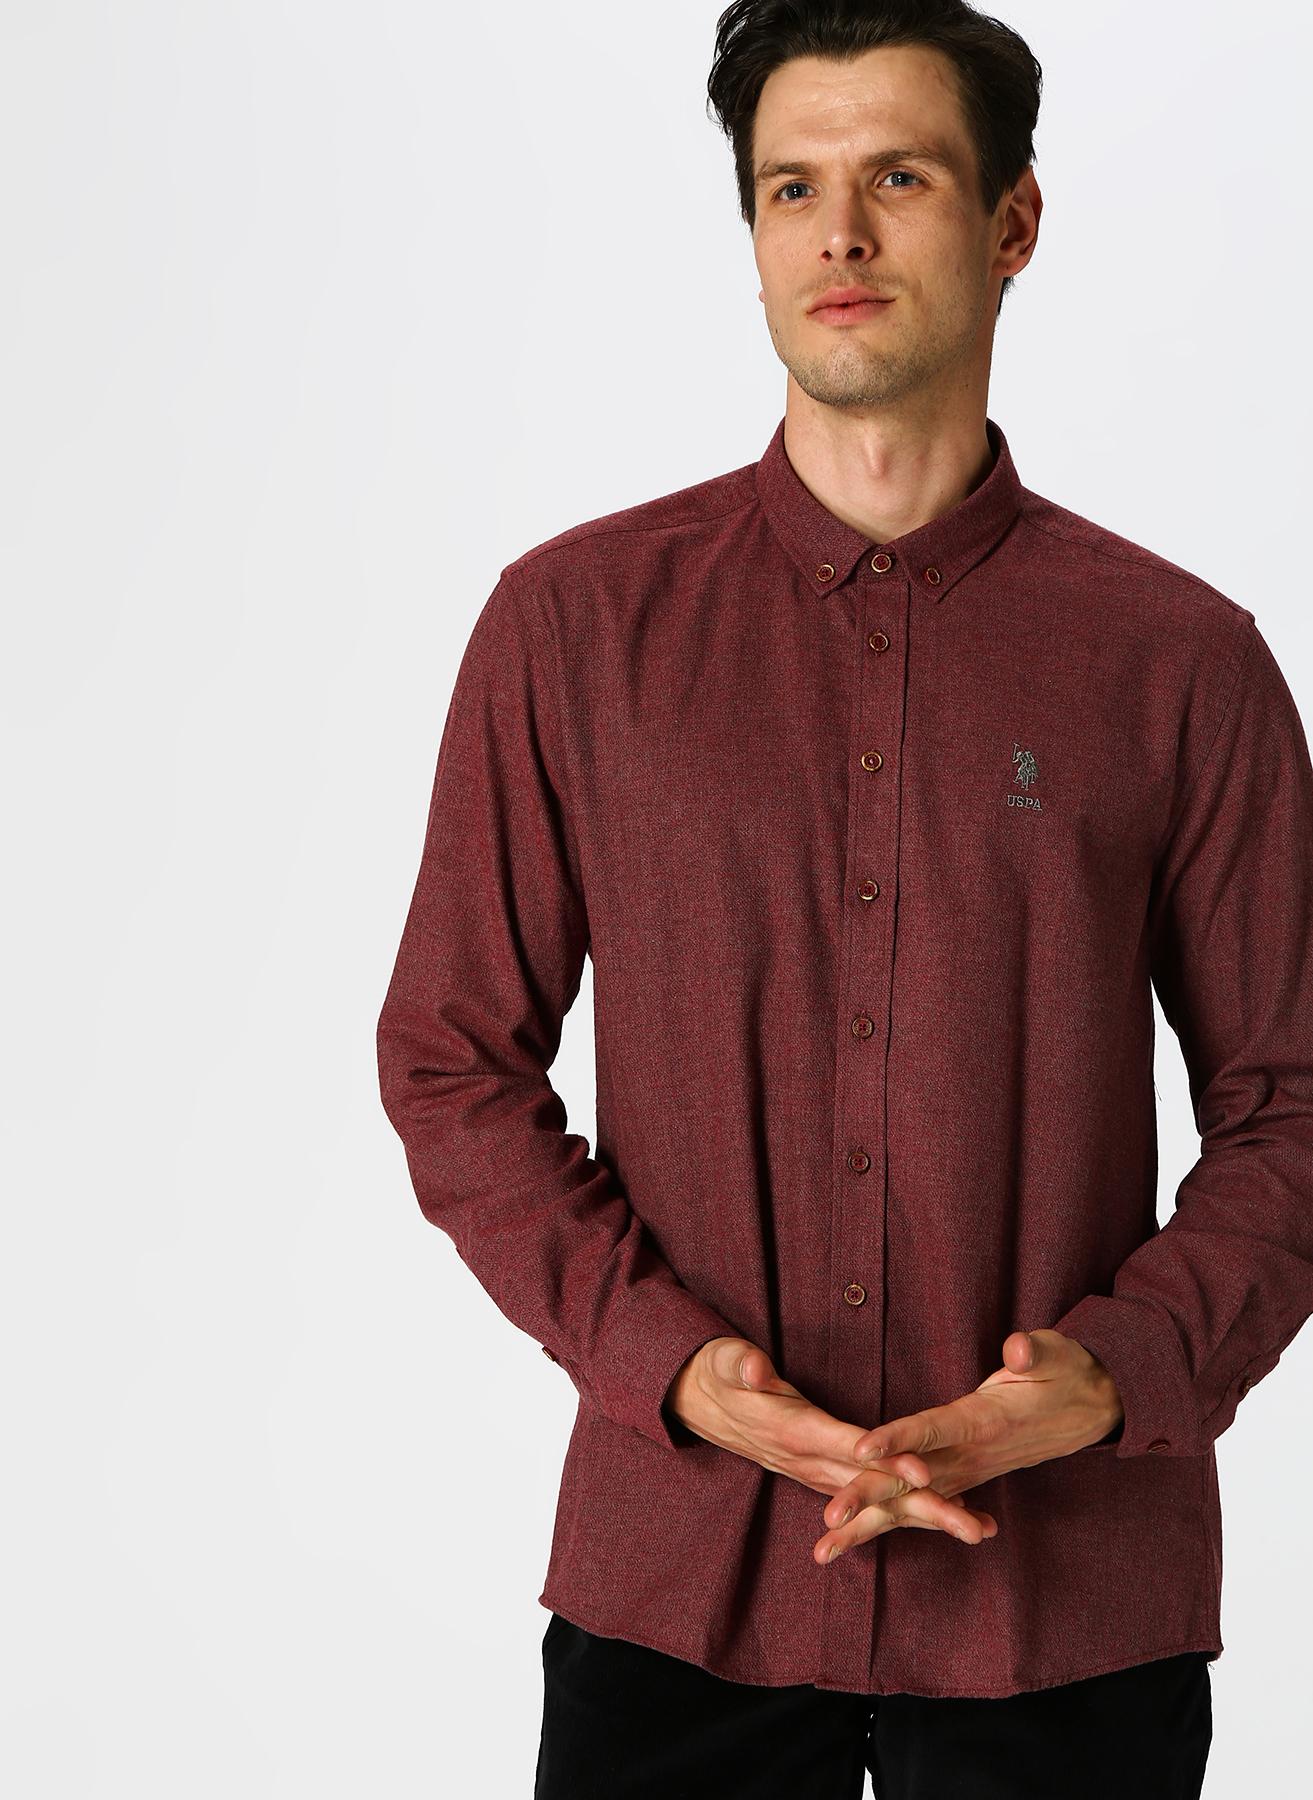 U.S. Polo Assn. Slim Fit Bordo Gömlek 2XL 5001704683005 Ürün Resmi